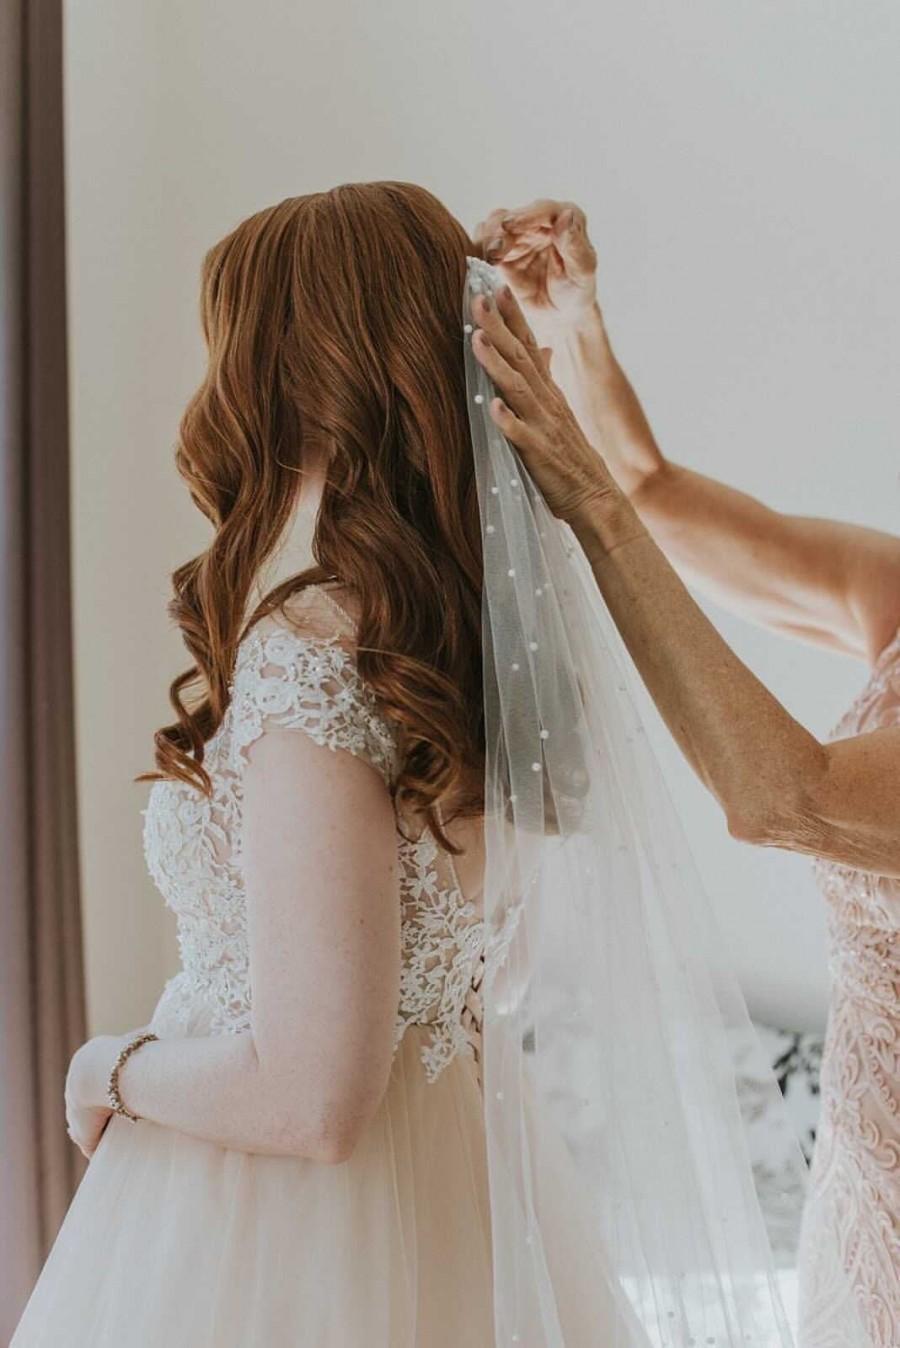 Mariage - Wedding veil with pearls, veil, veils, long veil, fingertip veil, beaded veil, pearl veil, champagne veil, ivory veil,  wedding, white veil